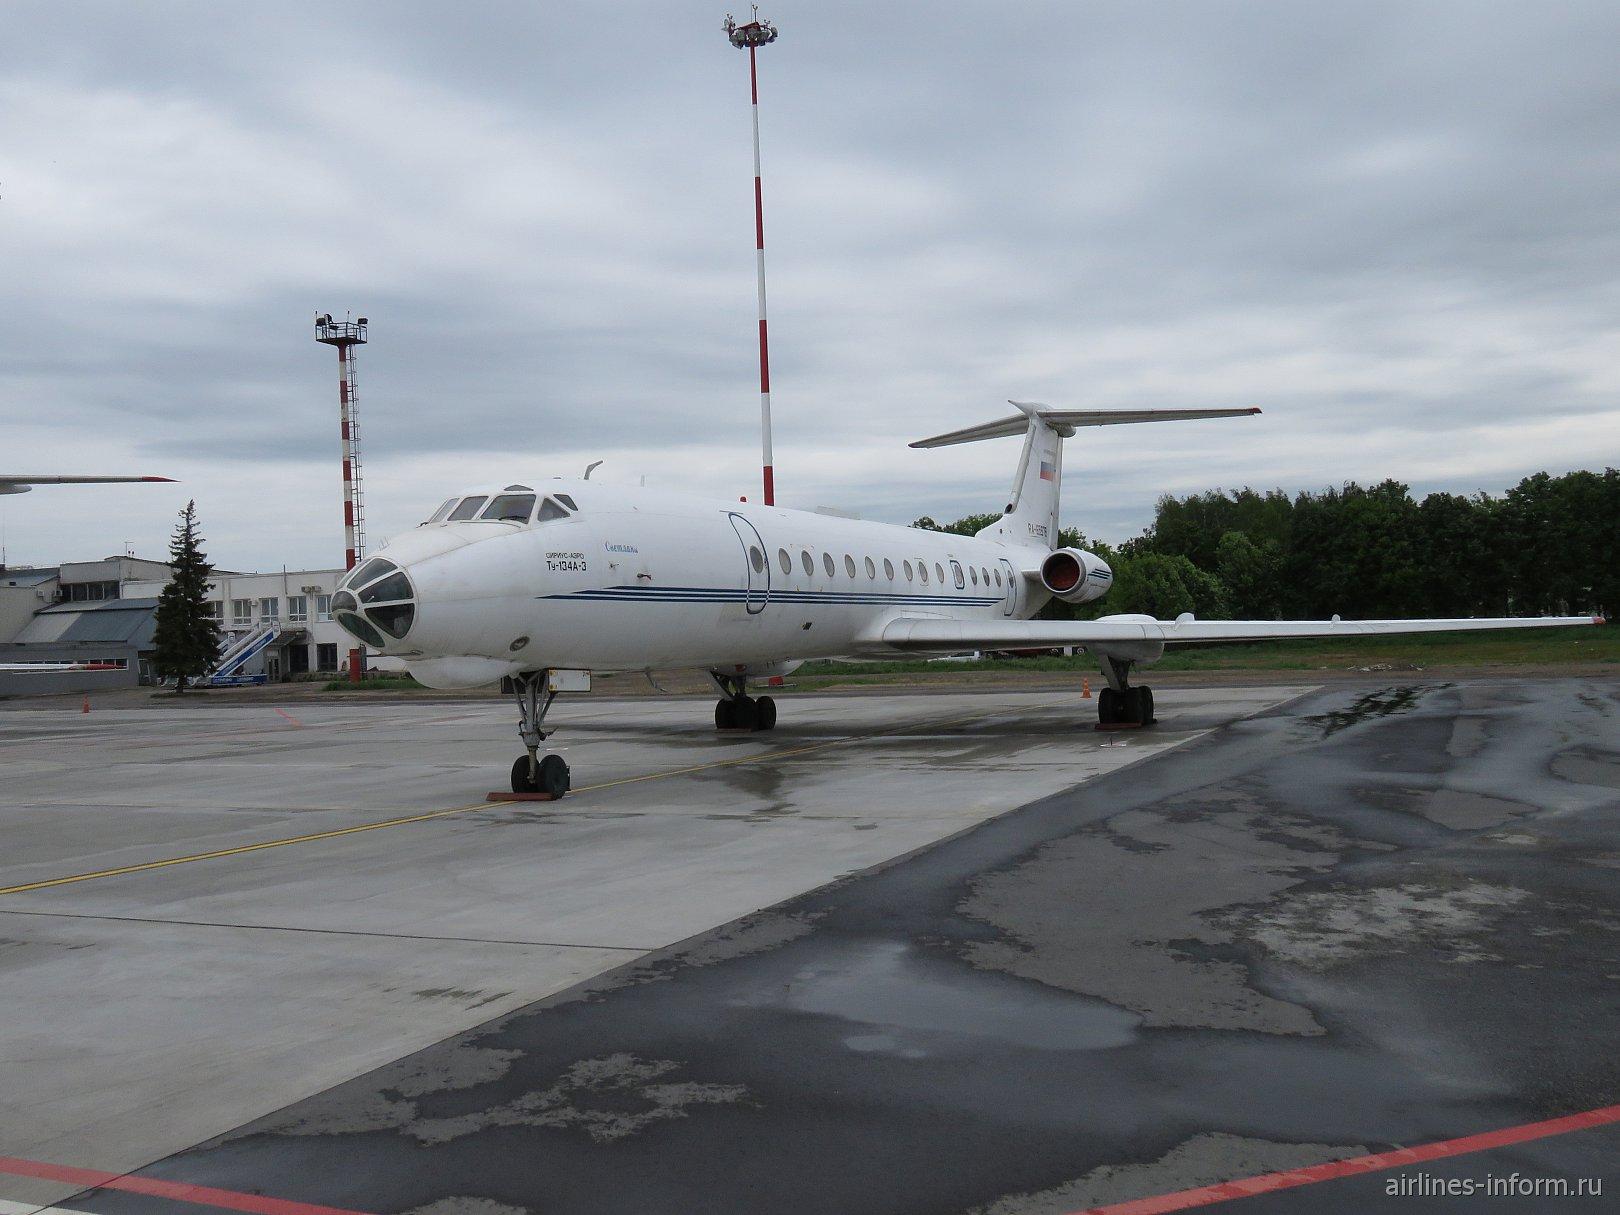 "Самолет Ту-134 авиакомпании ""Сириус-Аэро"" в аэропорту Стригино"